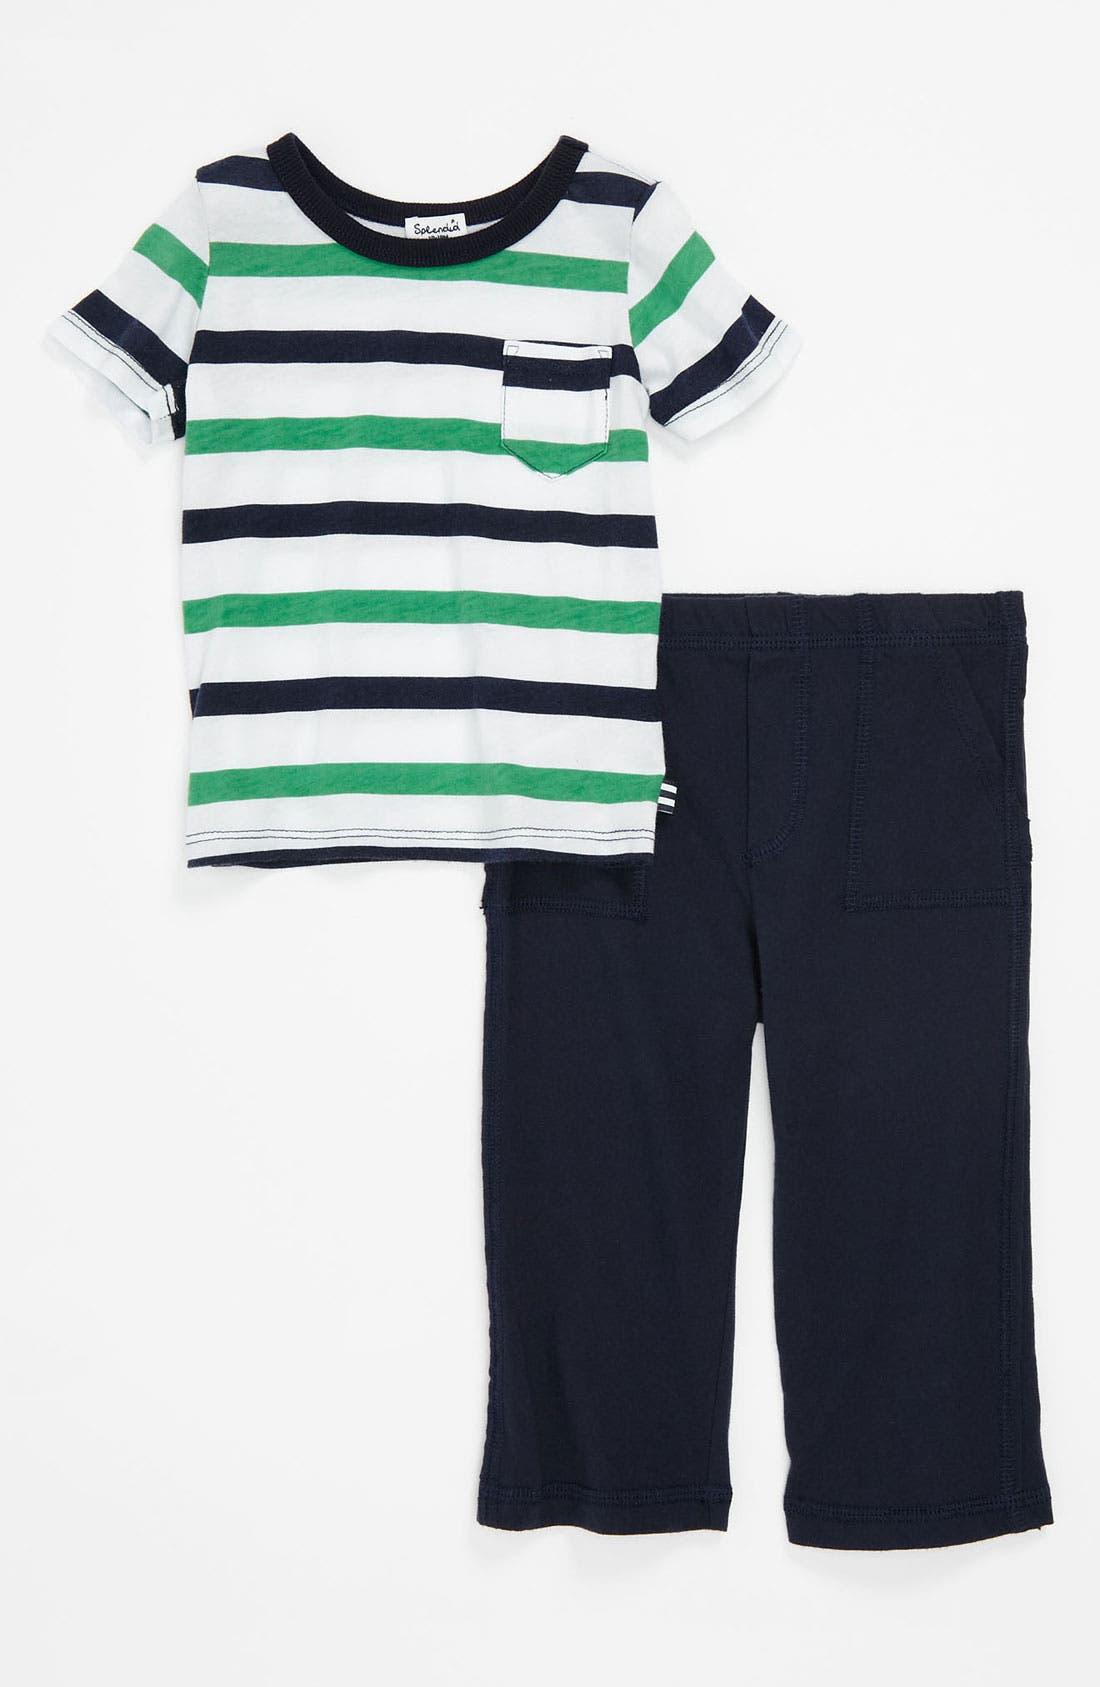 Main Image - Splendid Stripe Top & Knit Pants (Toddler)